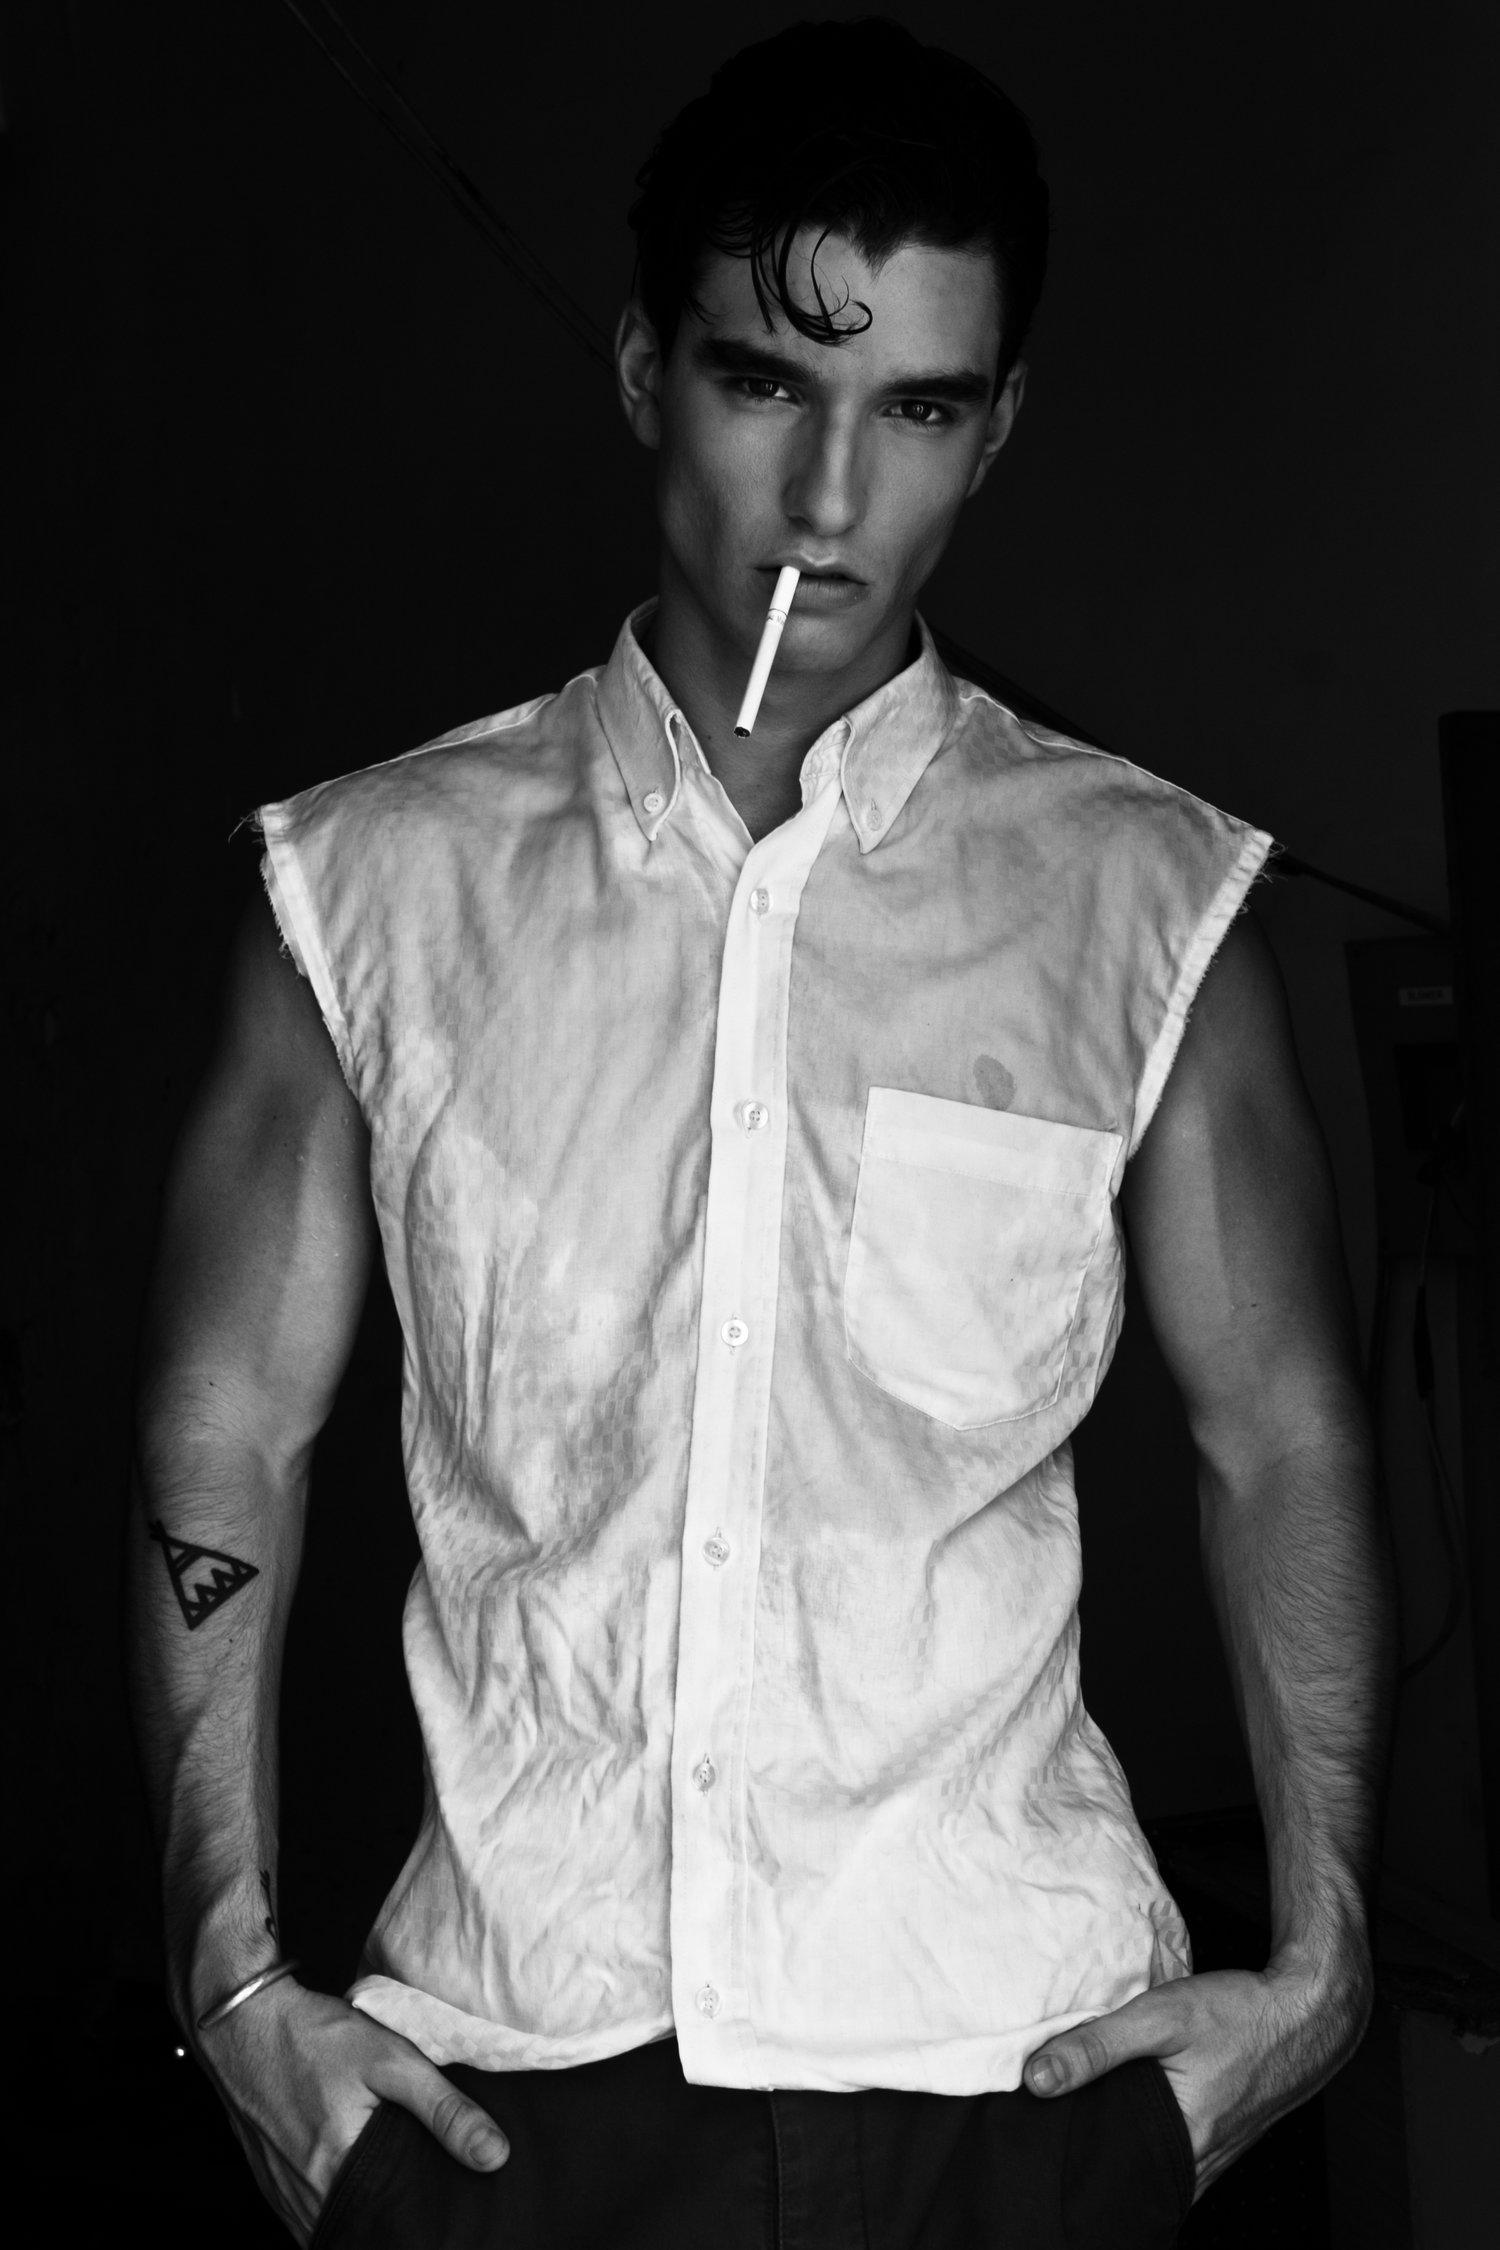 Adon Exclusive: Model Theo Laurencon By Xram Ragde